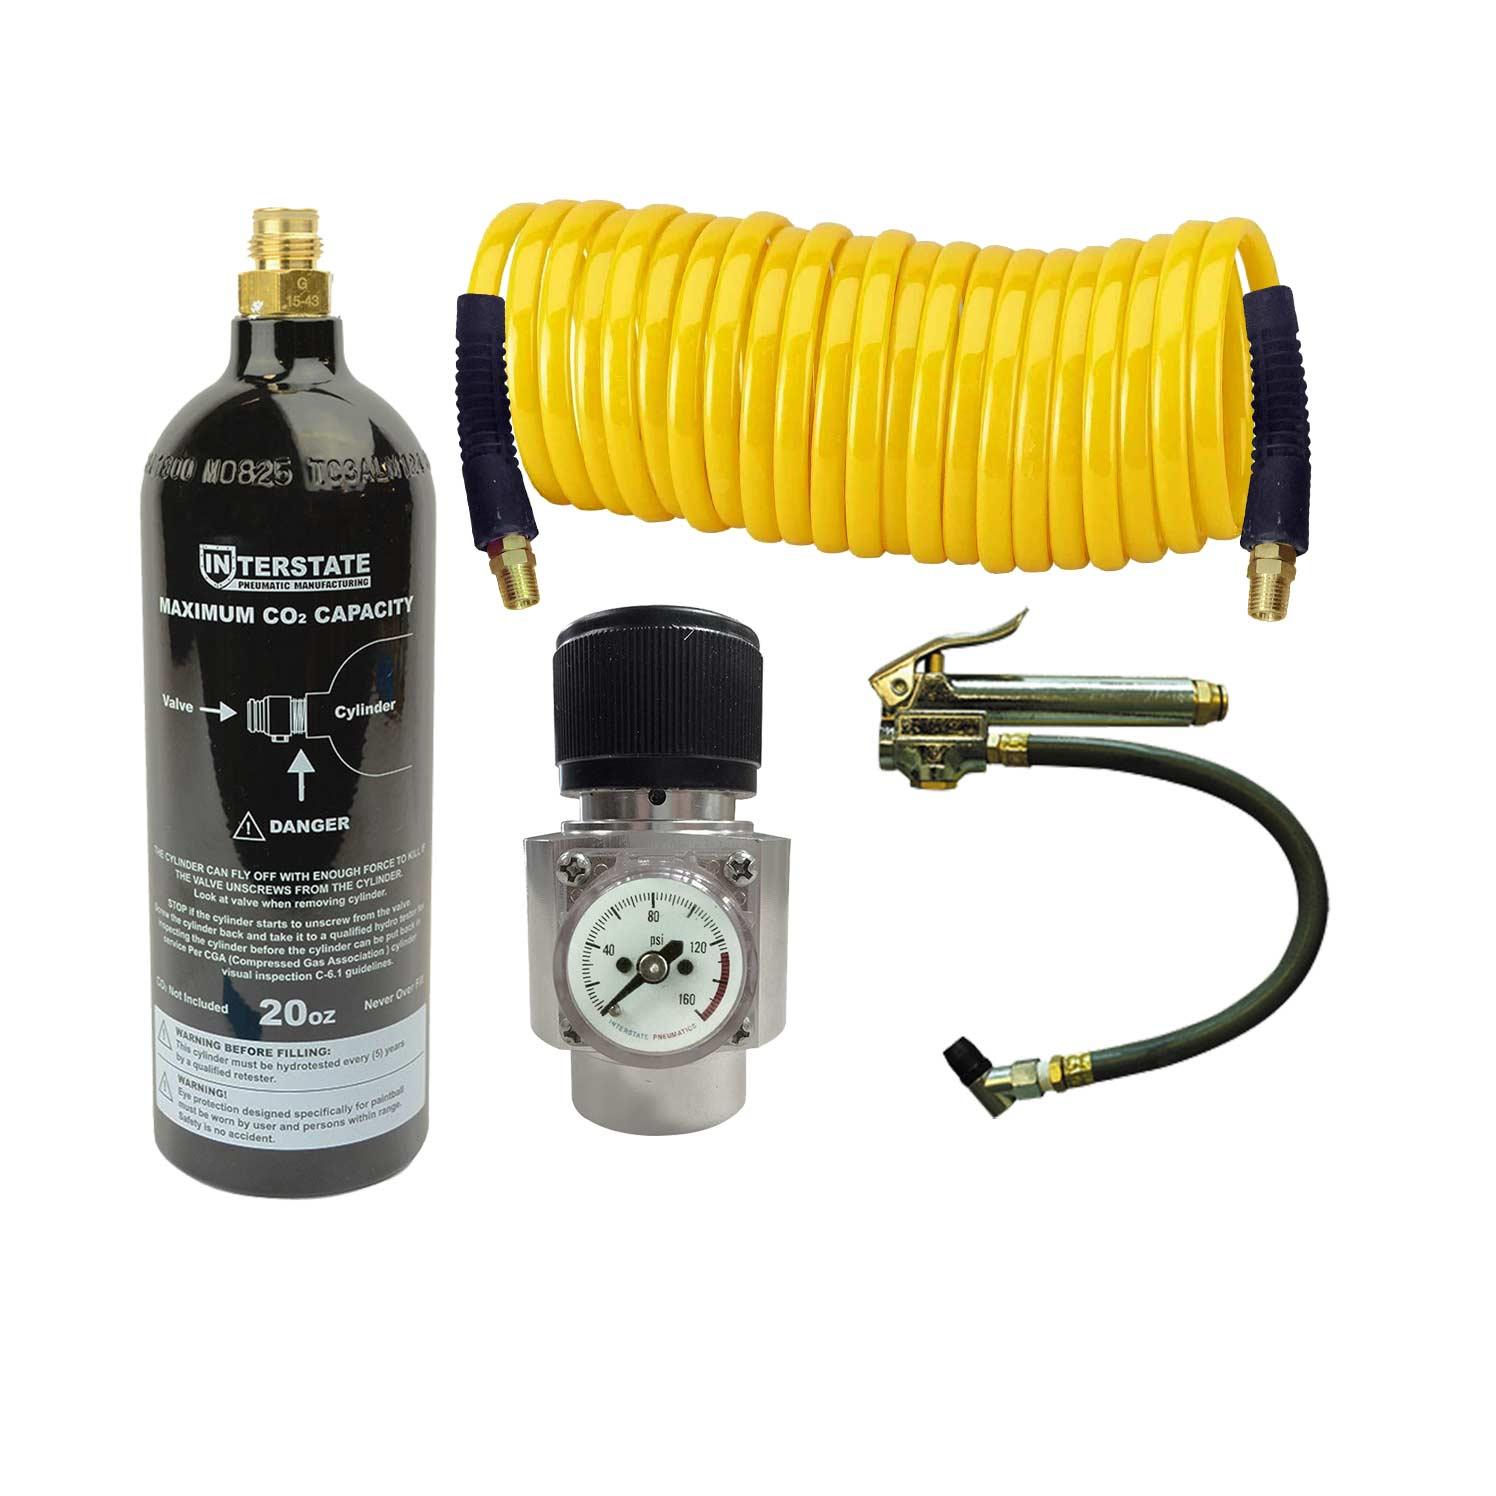 Interstate PneumaticsWRCO2-TF2CO2 Regulator, Recoil Hose, TF3135 Tire Inflator & 20 oz Co2 Cylinder